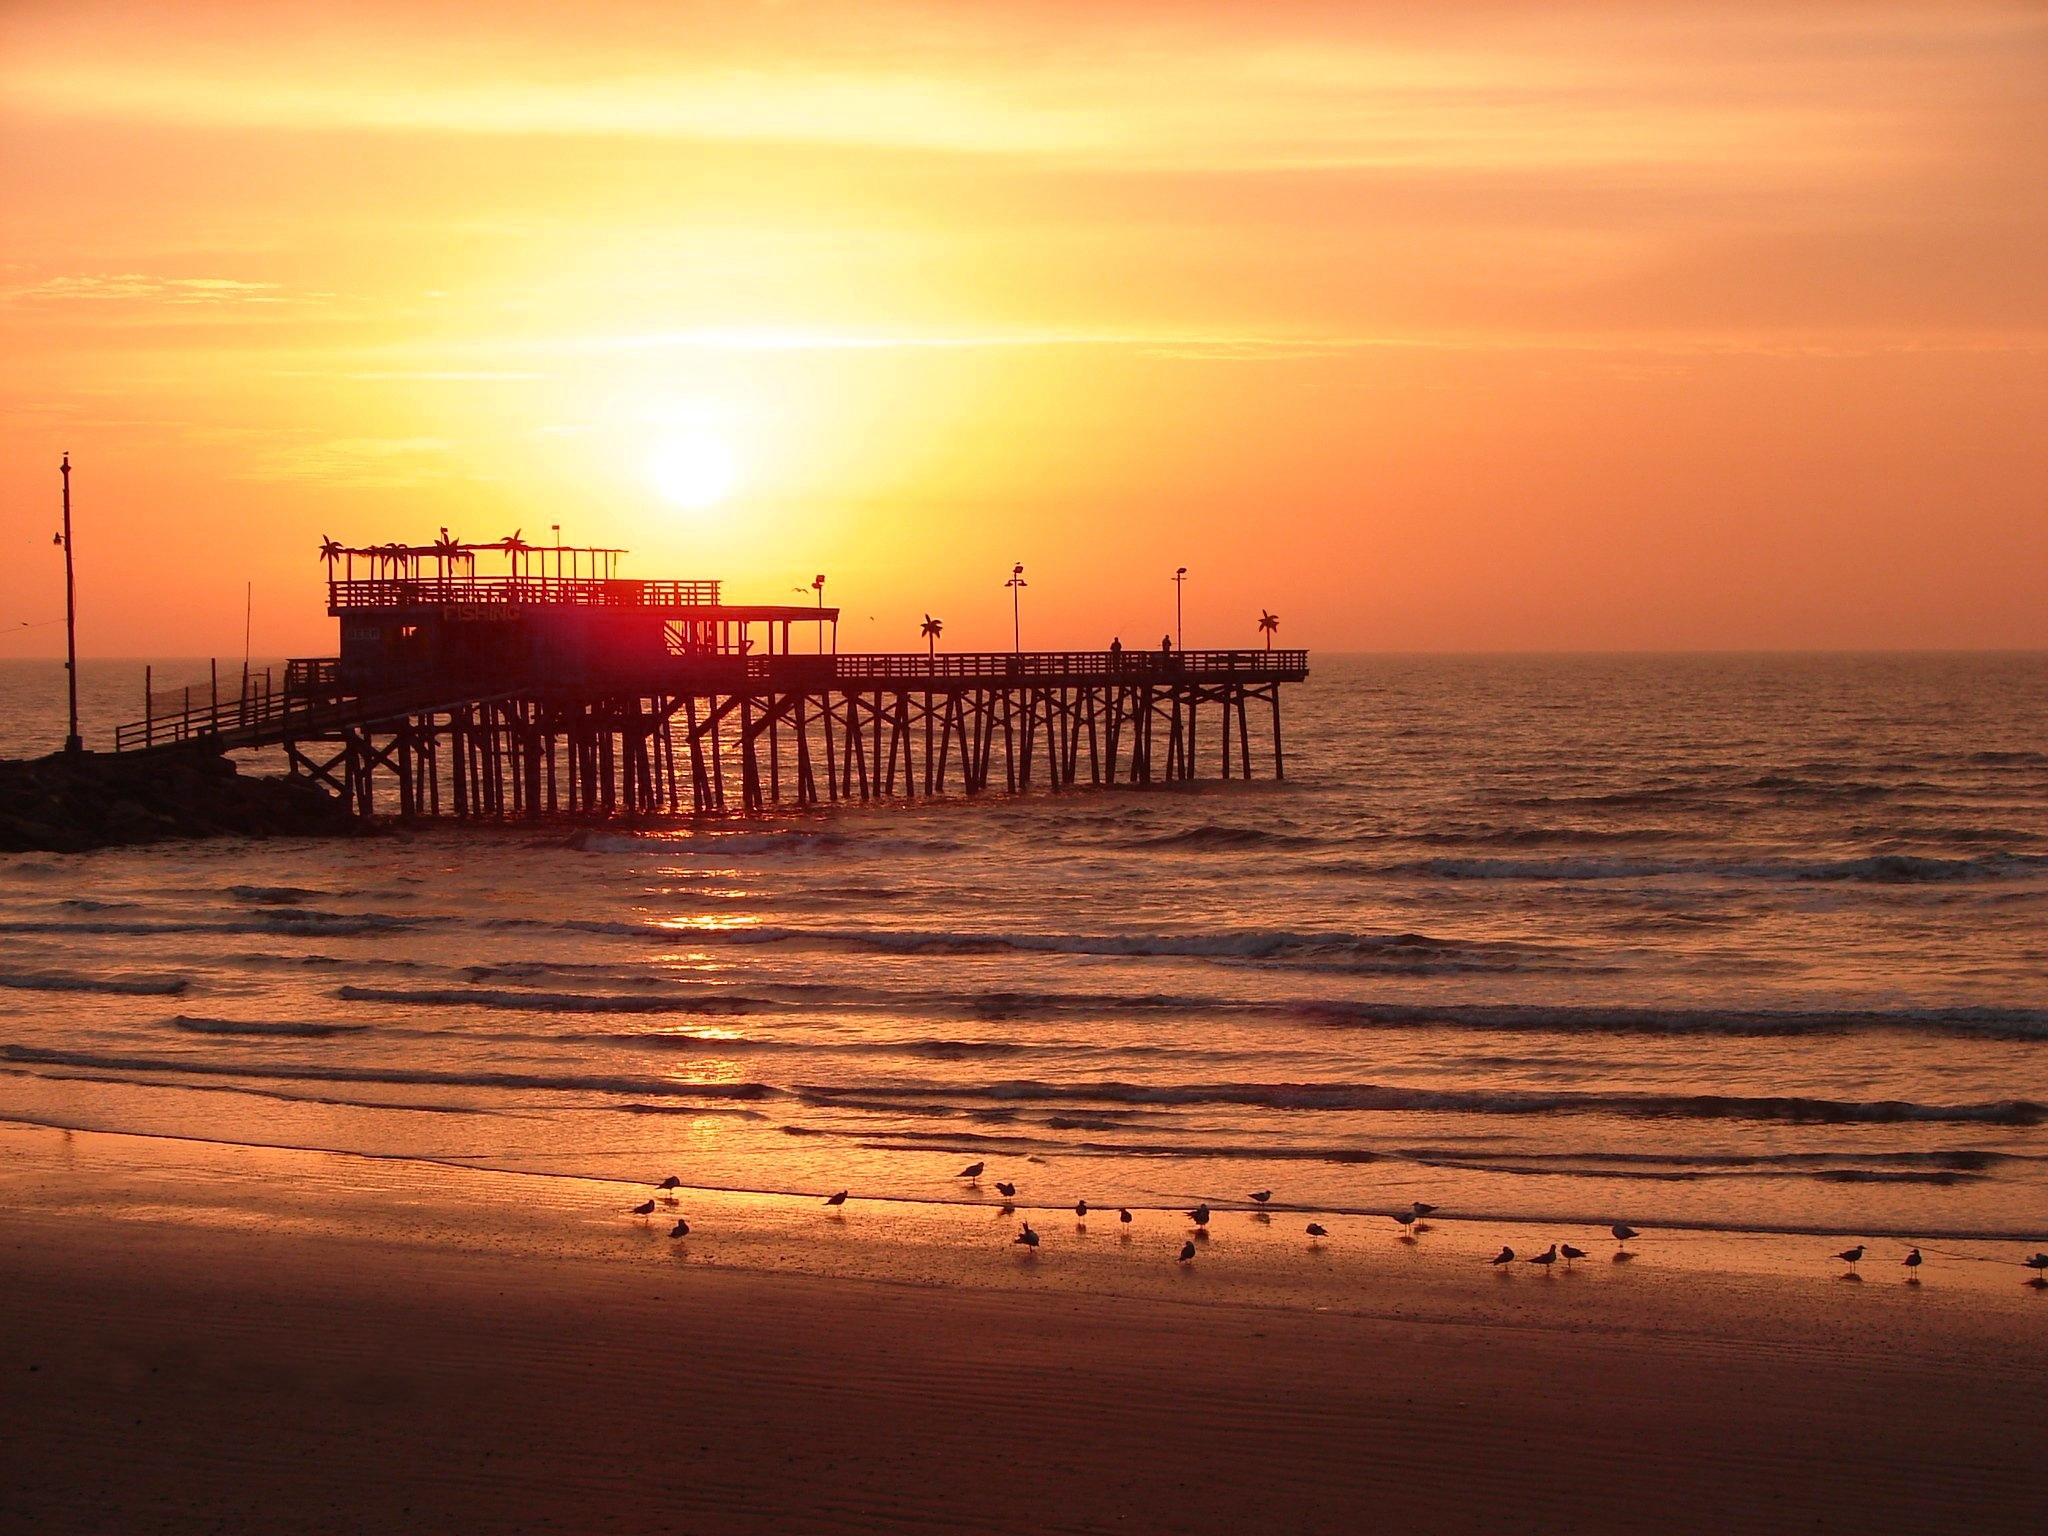 Orange_beach,_Galveston,_Texas_(5984947070)